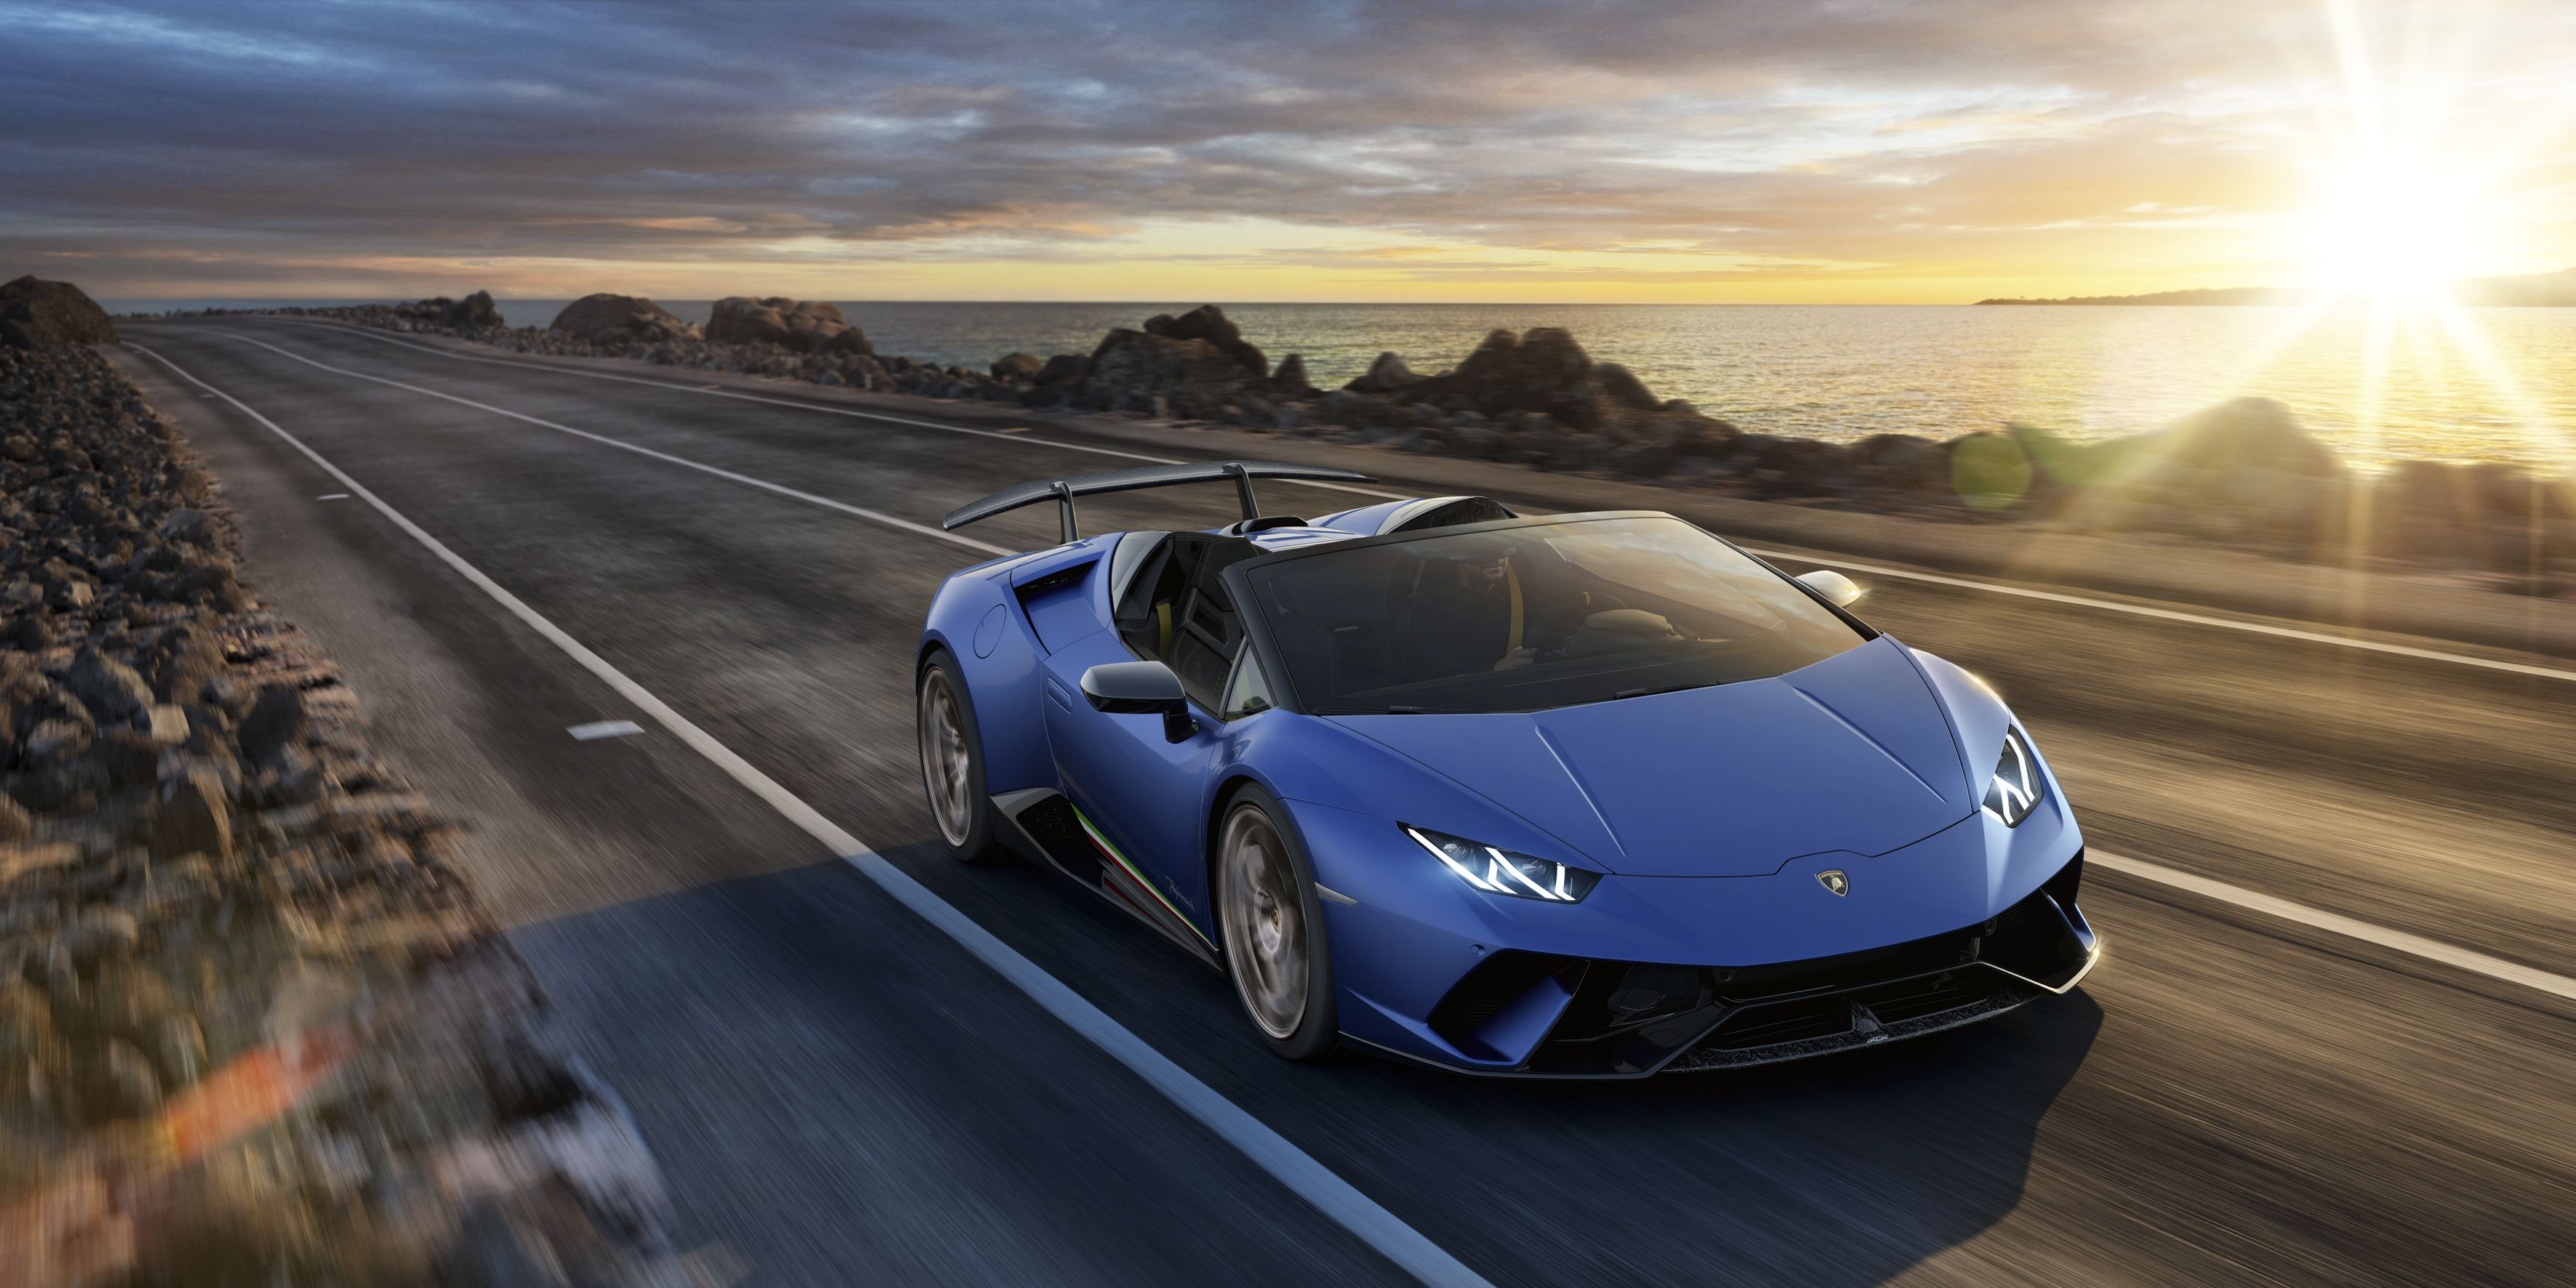 Rent Lamborghini Marseille Lamborghini Huracan Lamborghini Best Luxury Cars